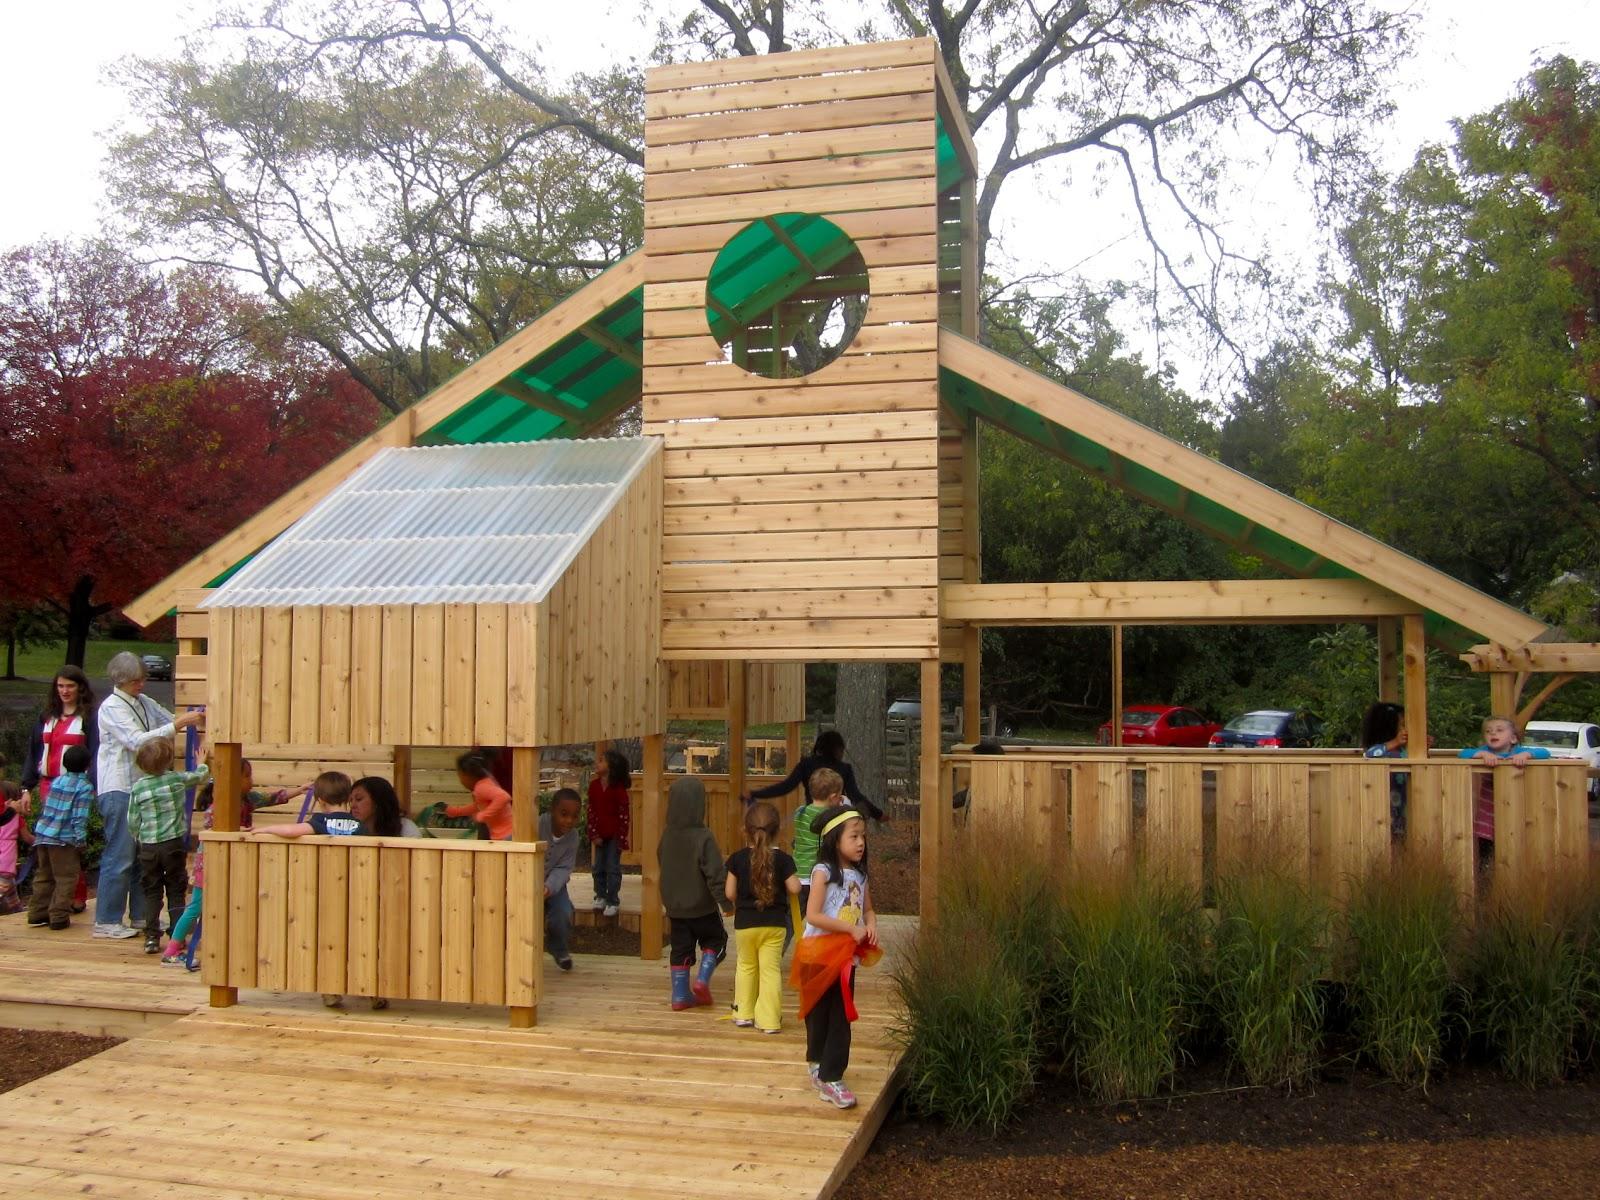 Outdoor Classroom Ideas Uk : Outdoor classrooms shelters 정자 pinterest